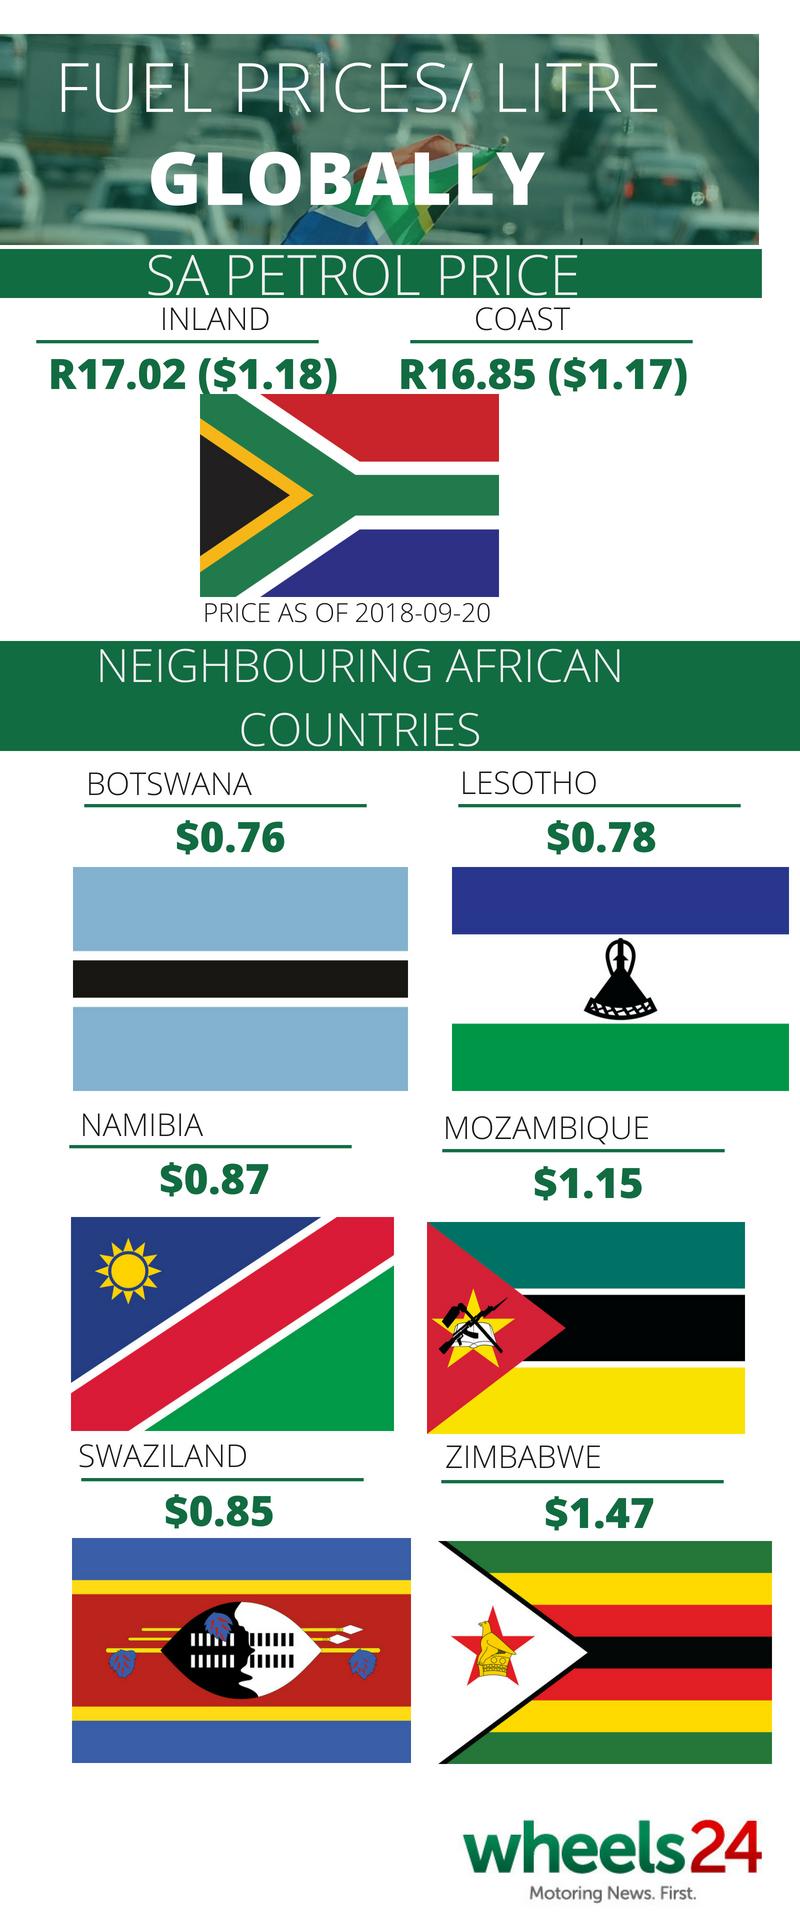 SADC countries fuel prices canva_ Khaya Dondolo